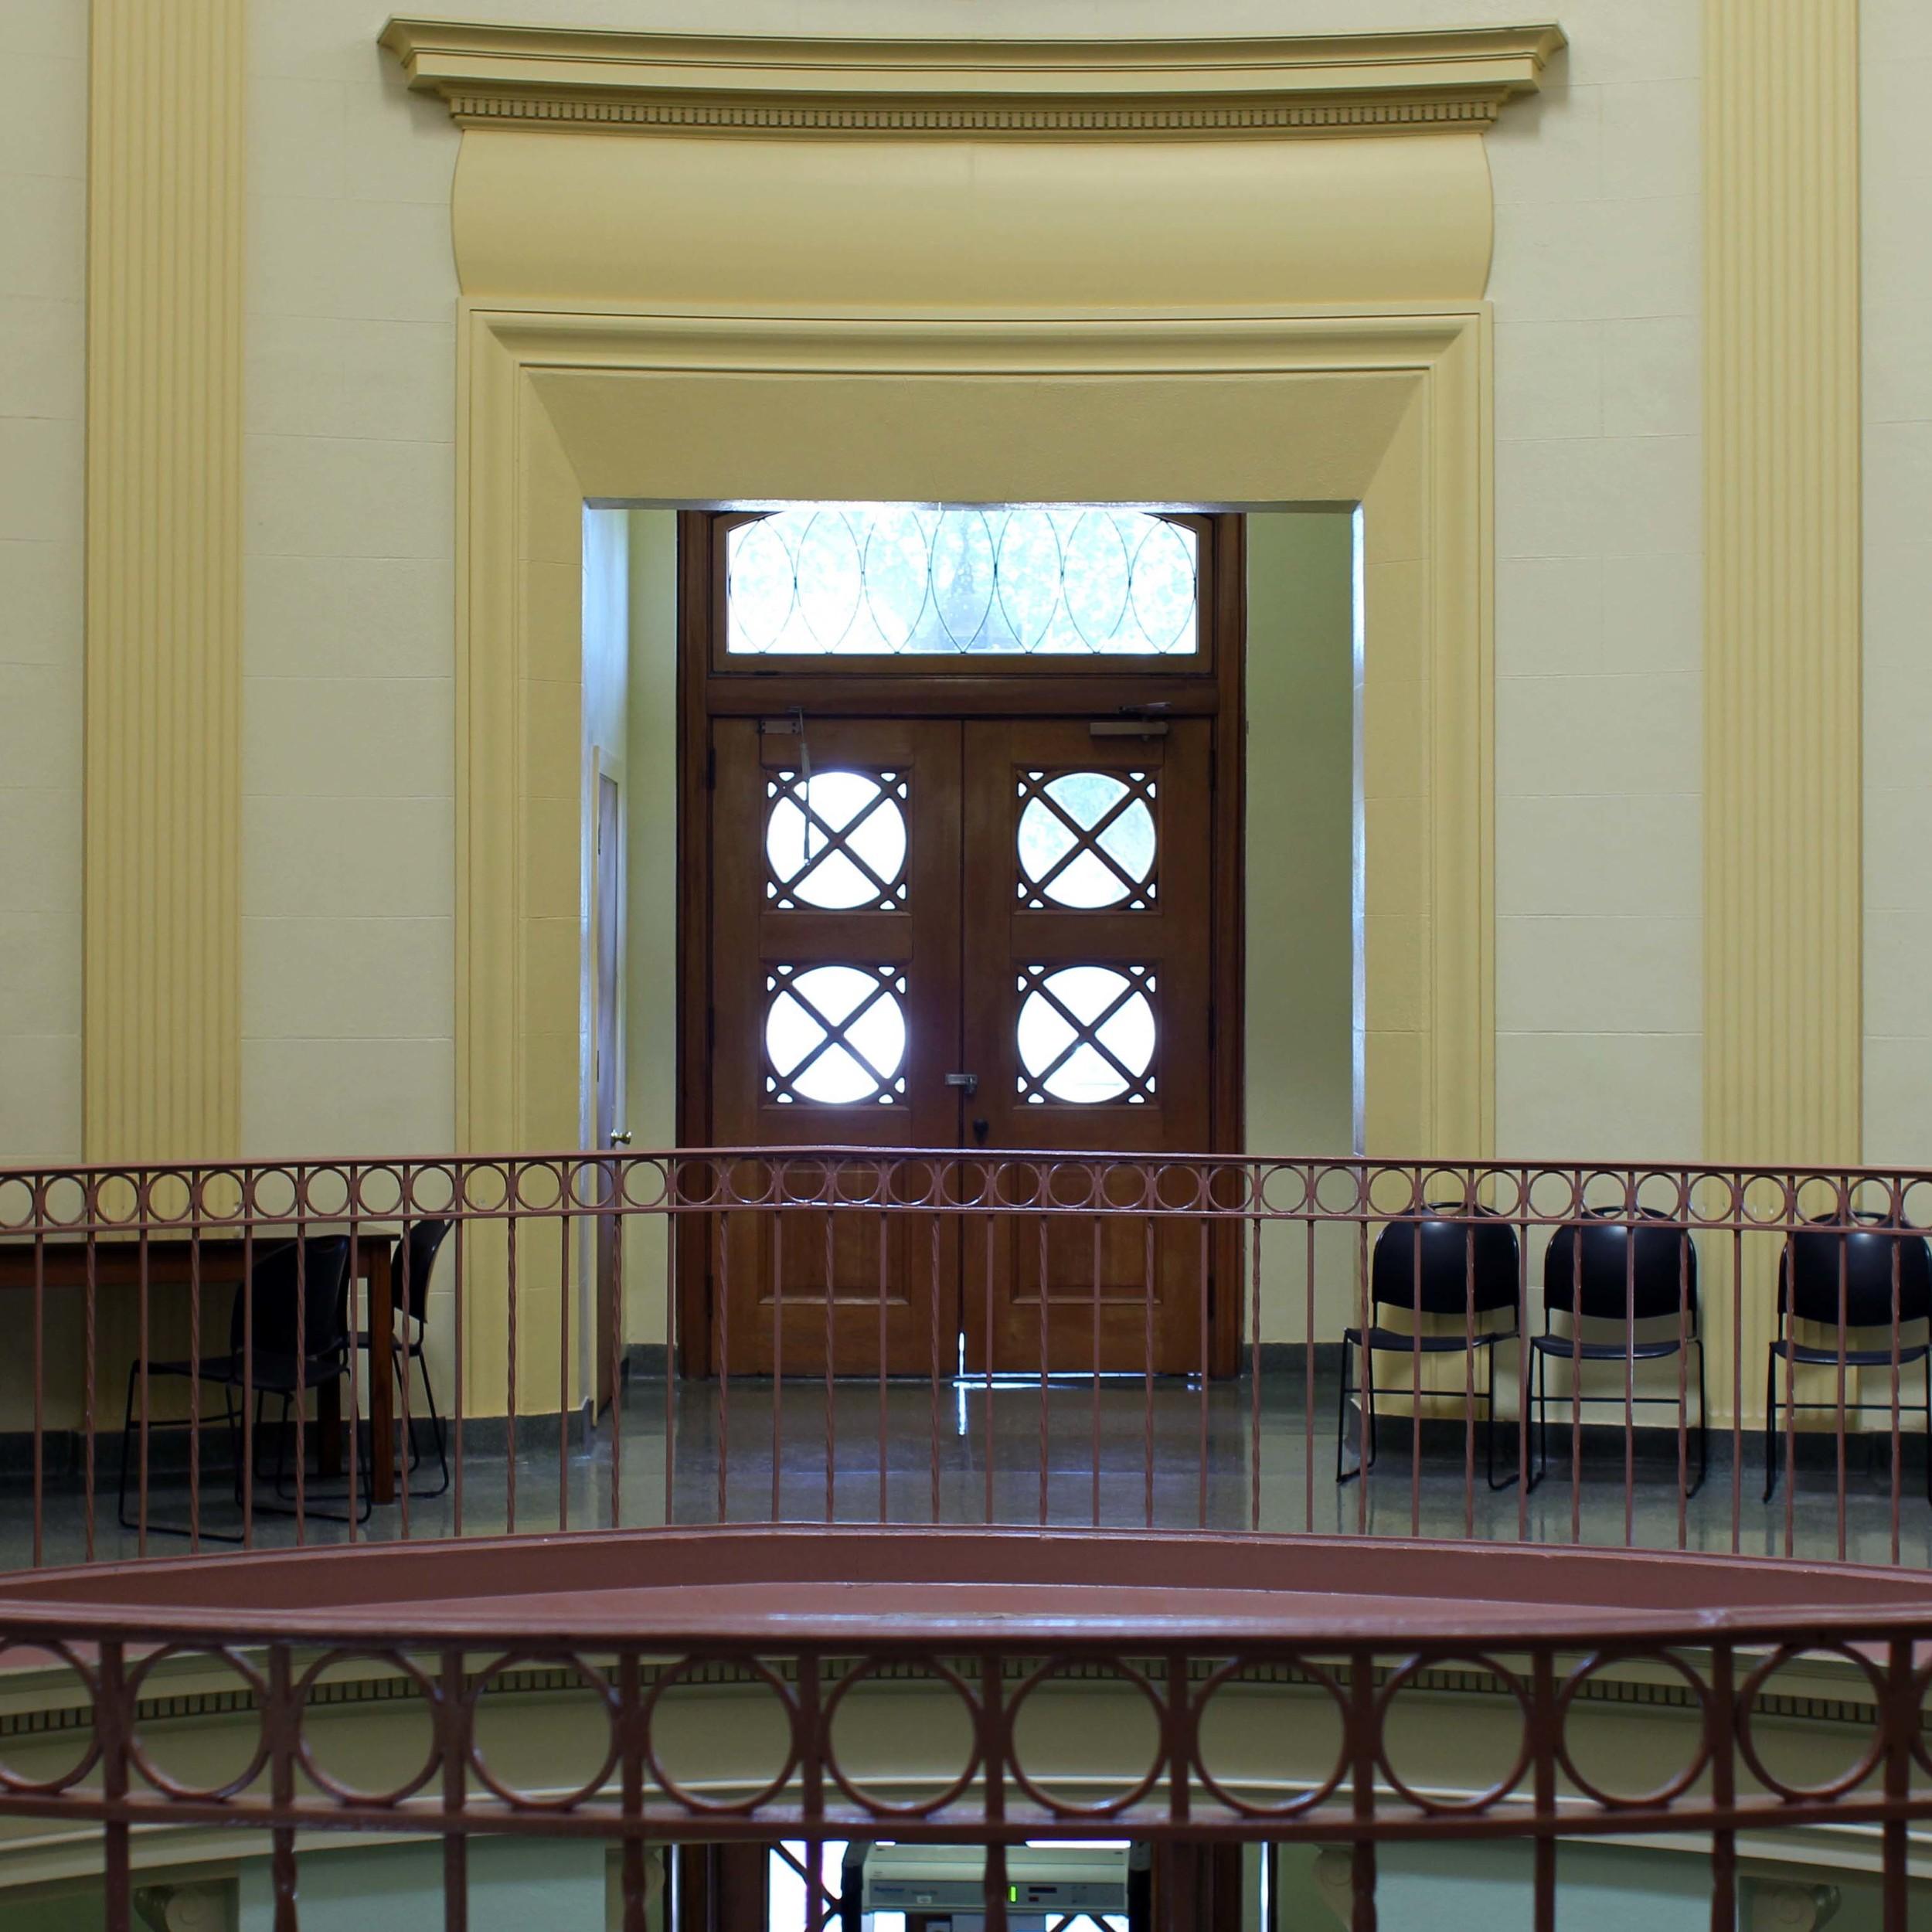 hernando-desoto-courthouse-1.jpg